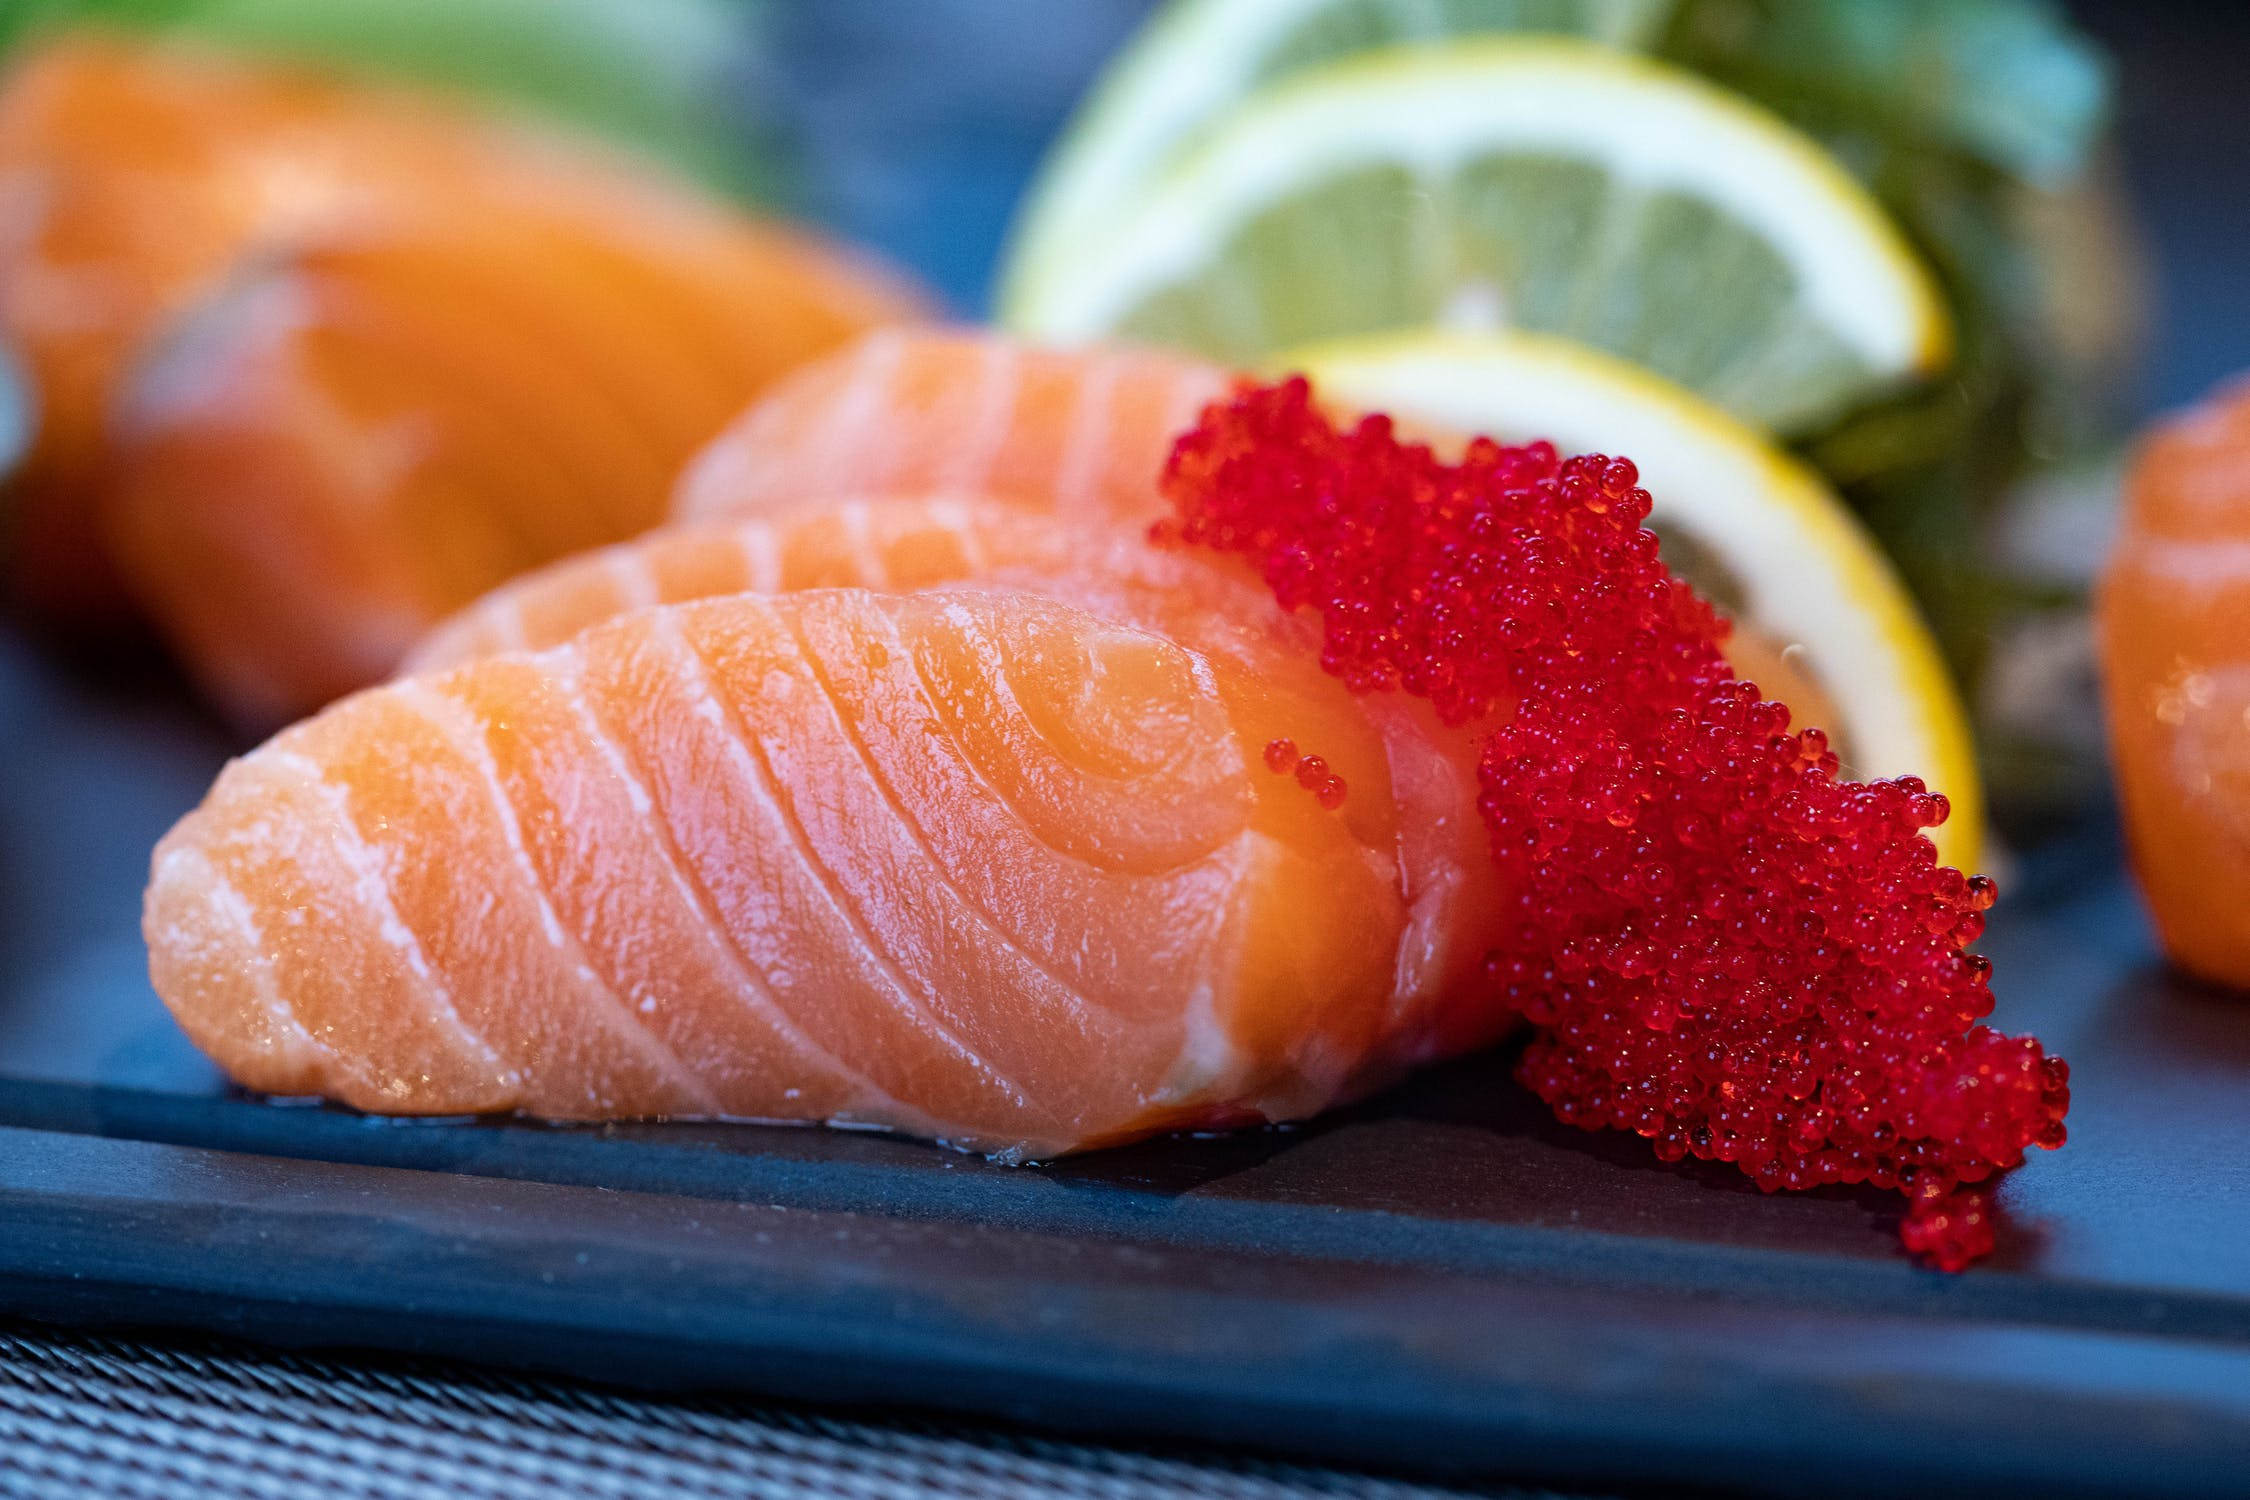 Plated salmon sashimi with fish eggs and slices of lemon.